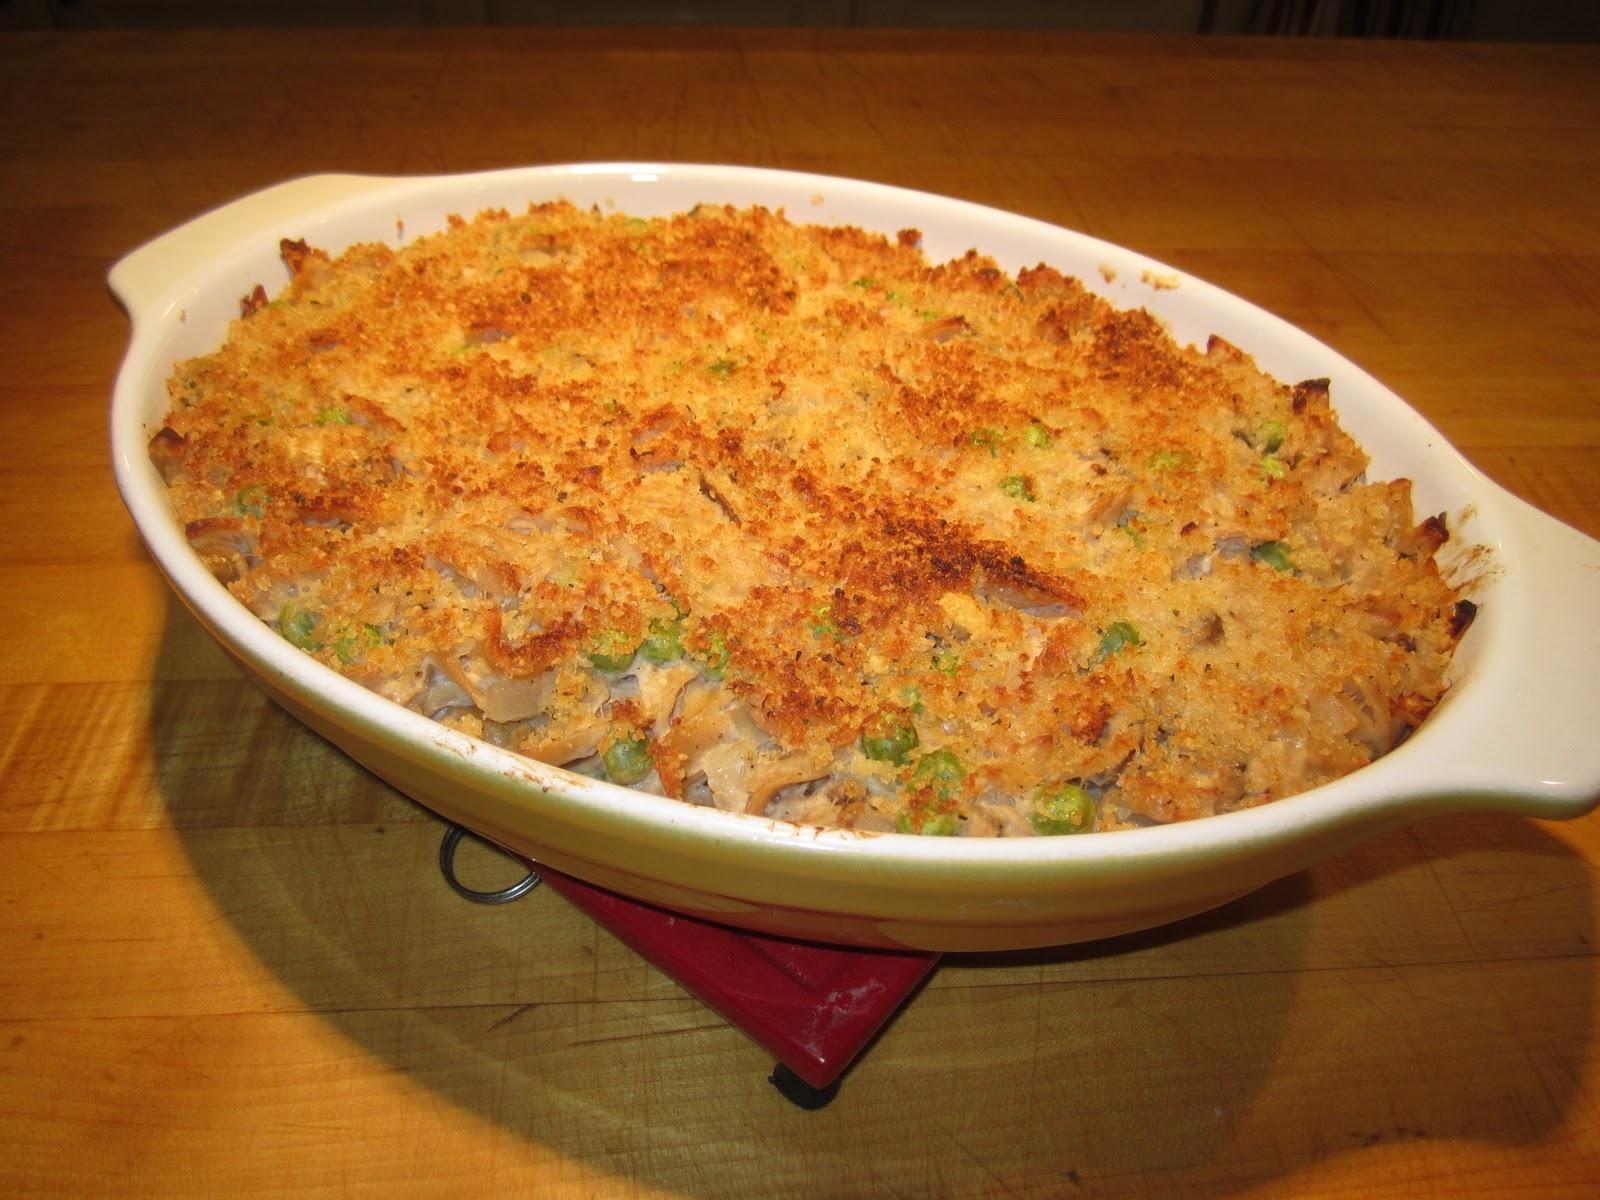 ... Mediterranea de Fideos con atun or Mediterranean Tuna-Noodle Casserole